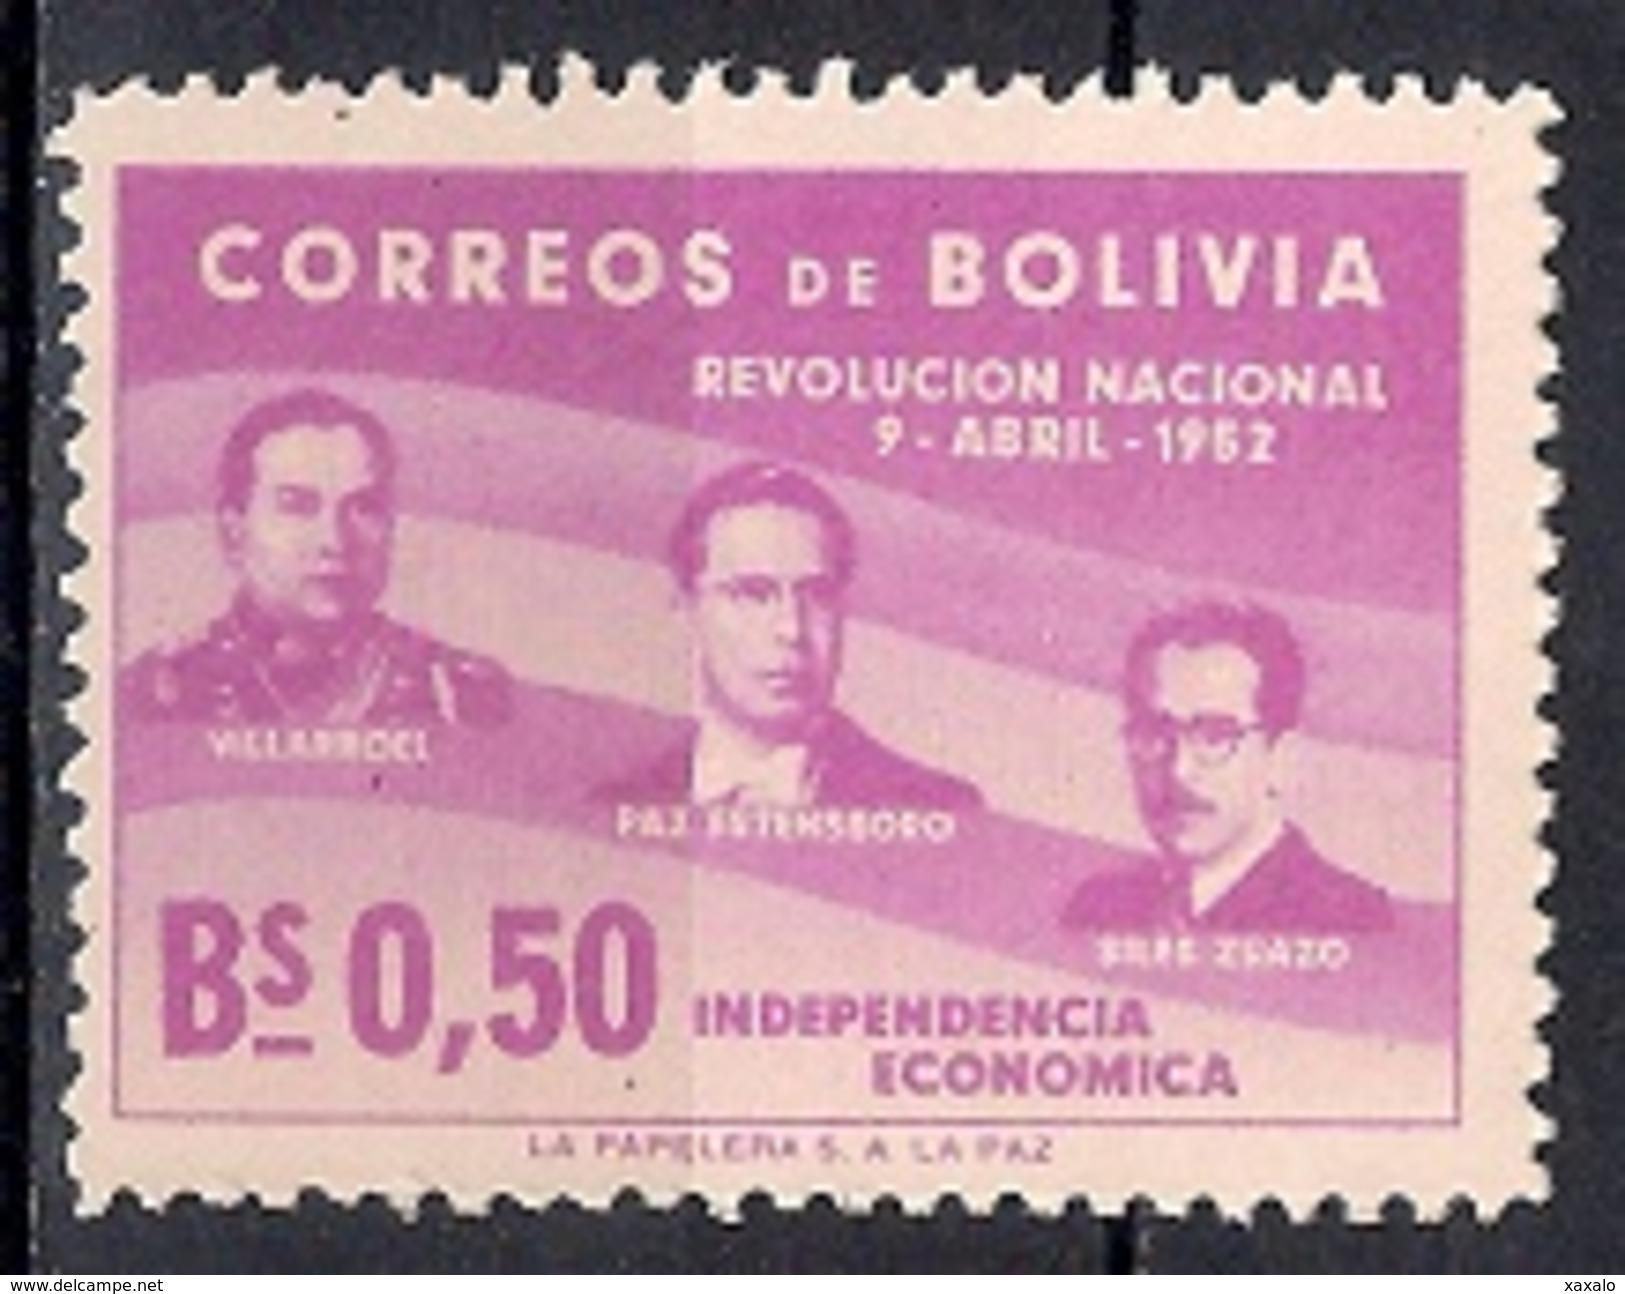 ((A) Bolivia 1953 - The 1st Anniversary Of The Revolution Of April 9th, 1952 - Villarroel, Paz Estenssoro And Siles Zuaz - Bolivia